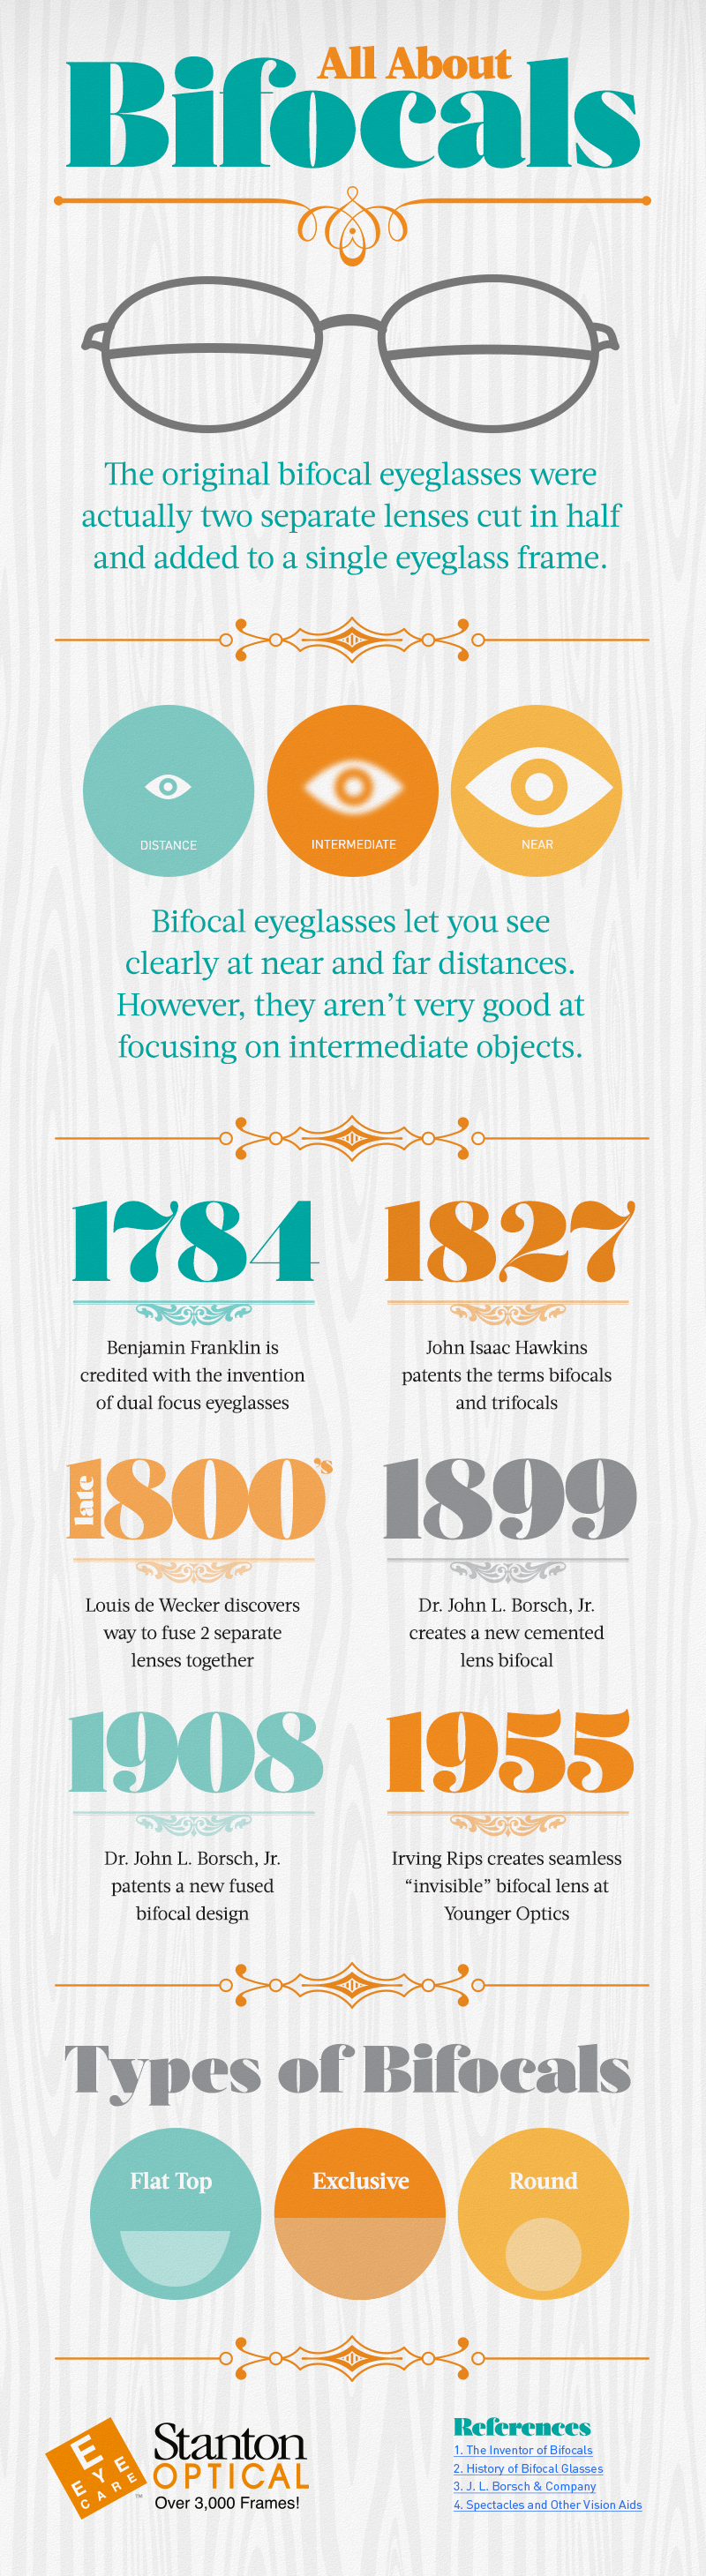 Facts About Bifocals